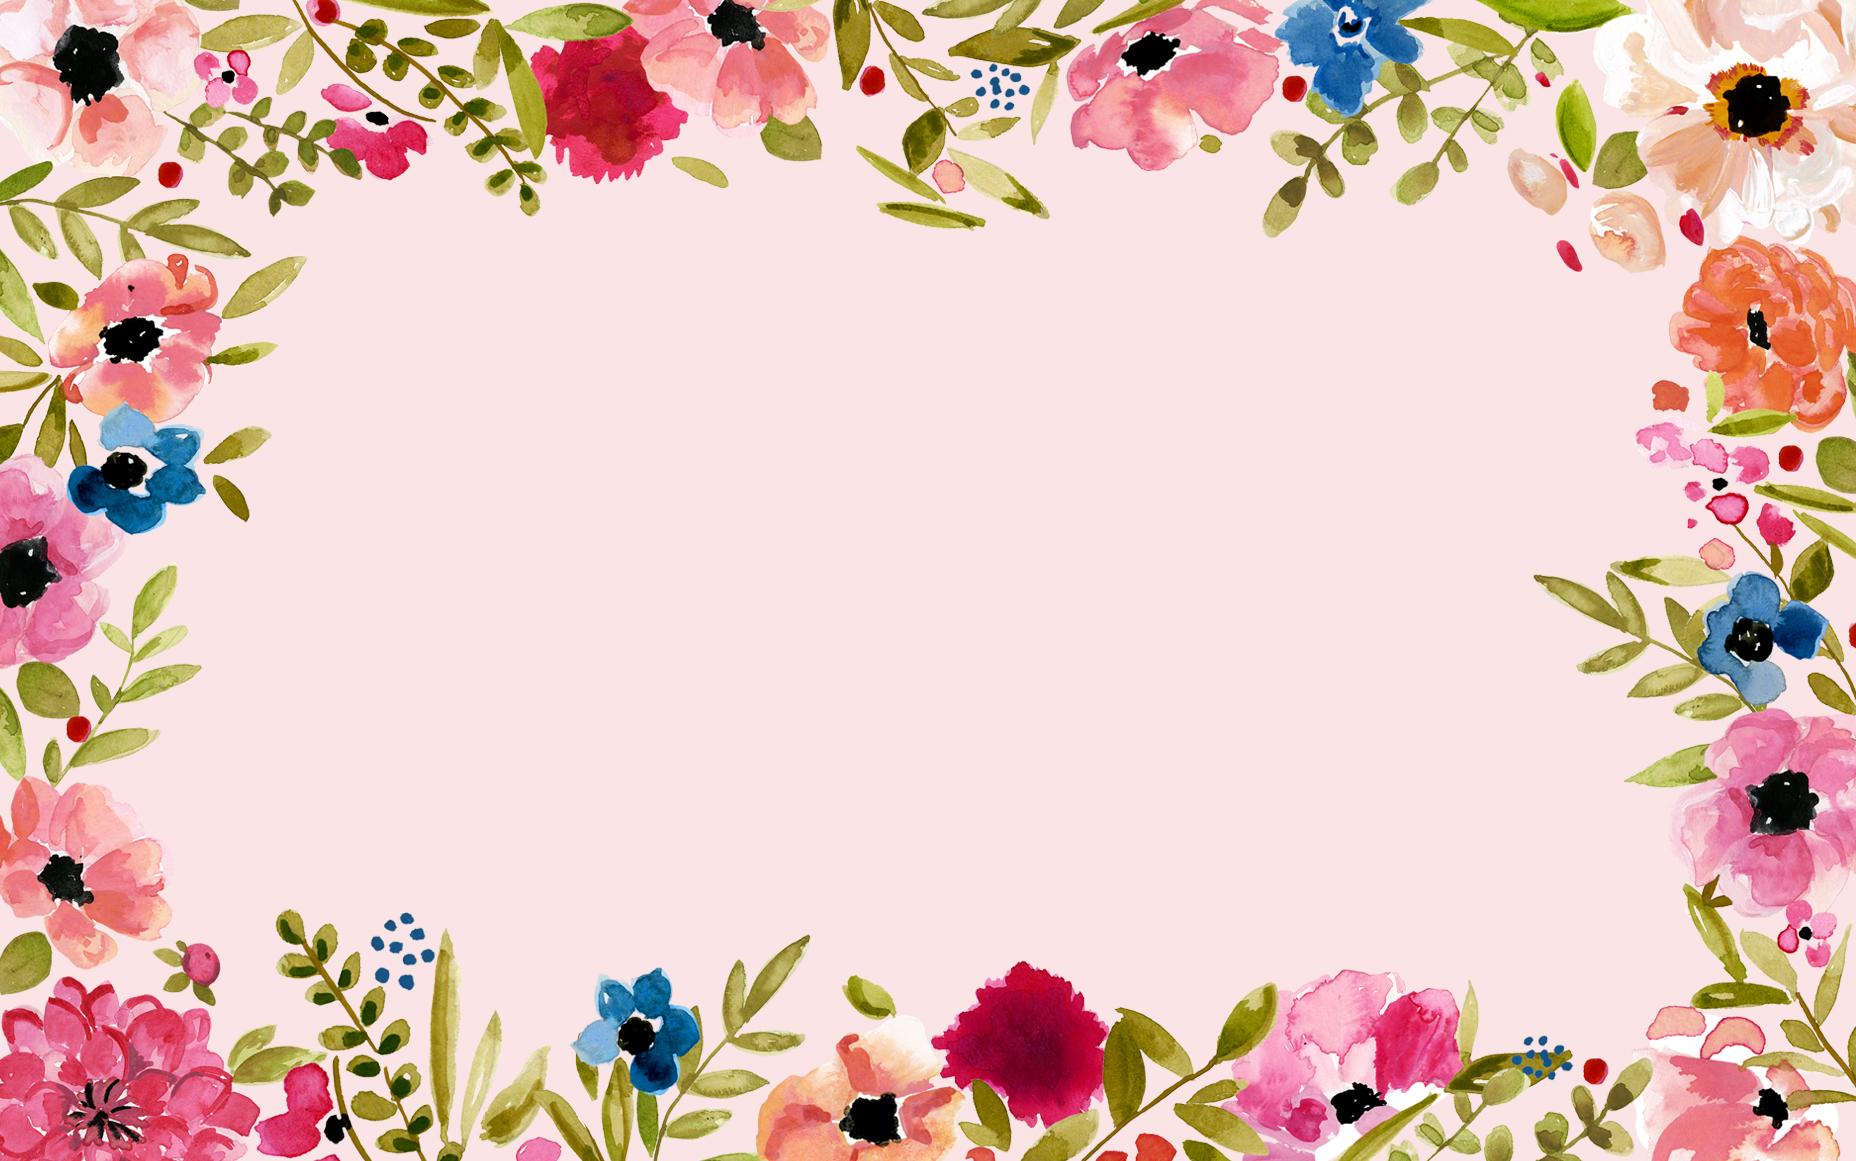 17+ ideas about Desktop Wallpapers on Pinterest   Computer